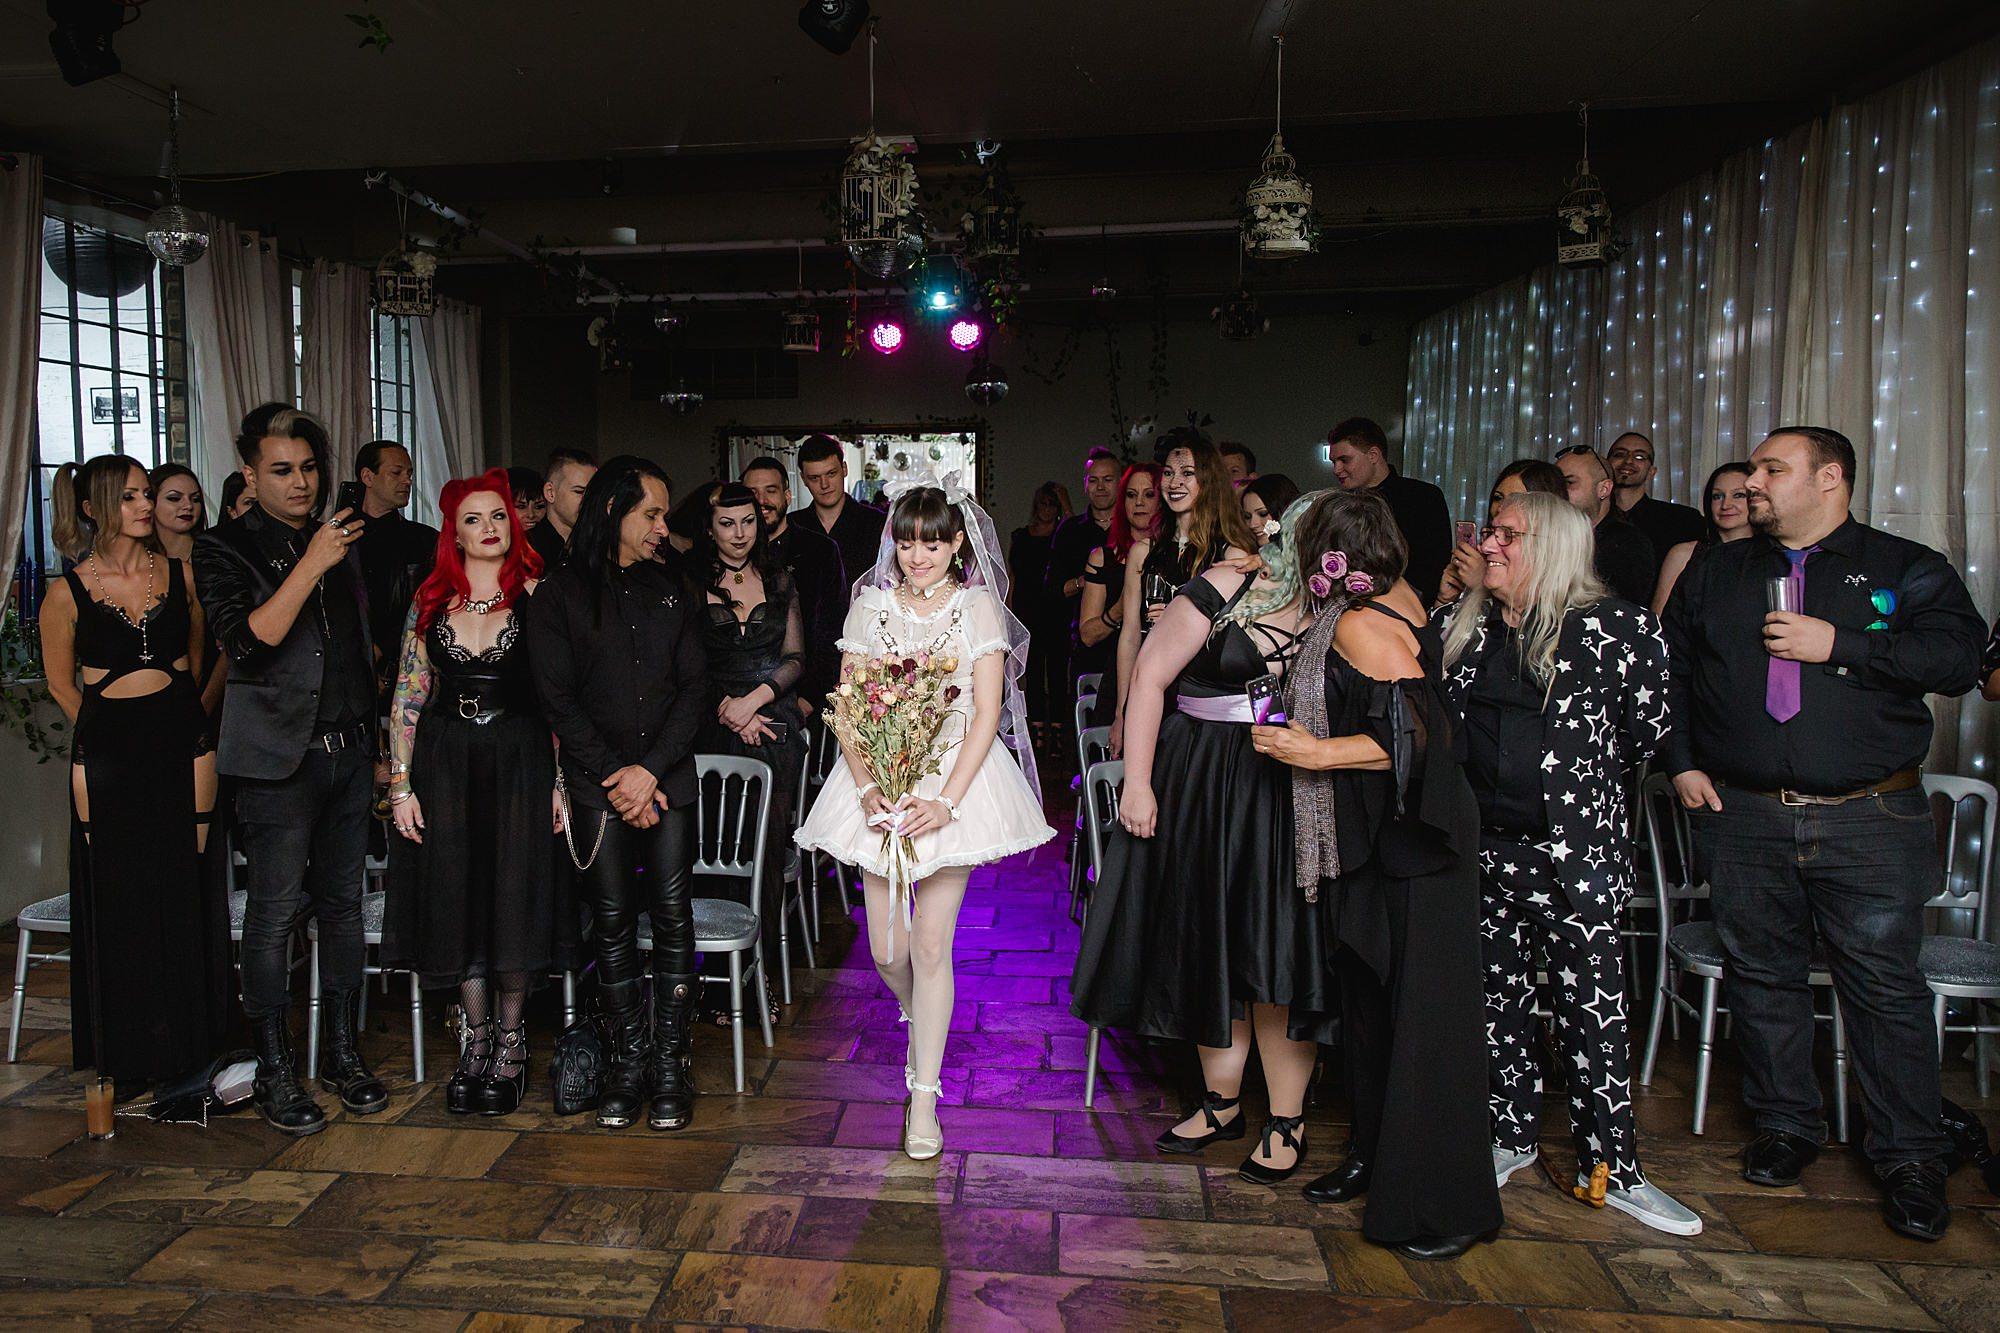 Gothic wedding London bride walks down the aisle at islington metalworks